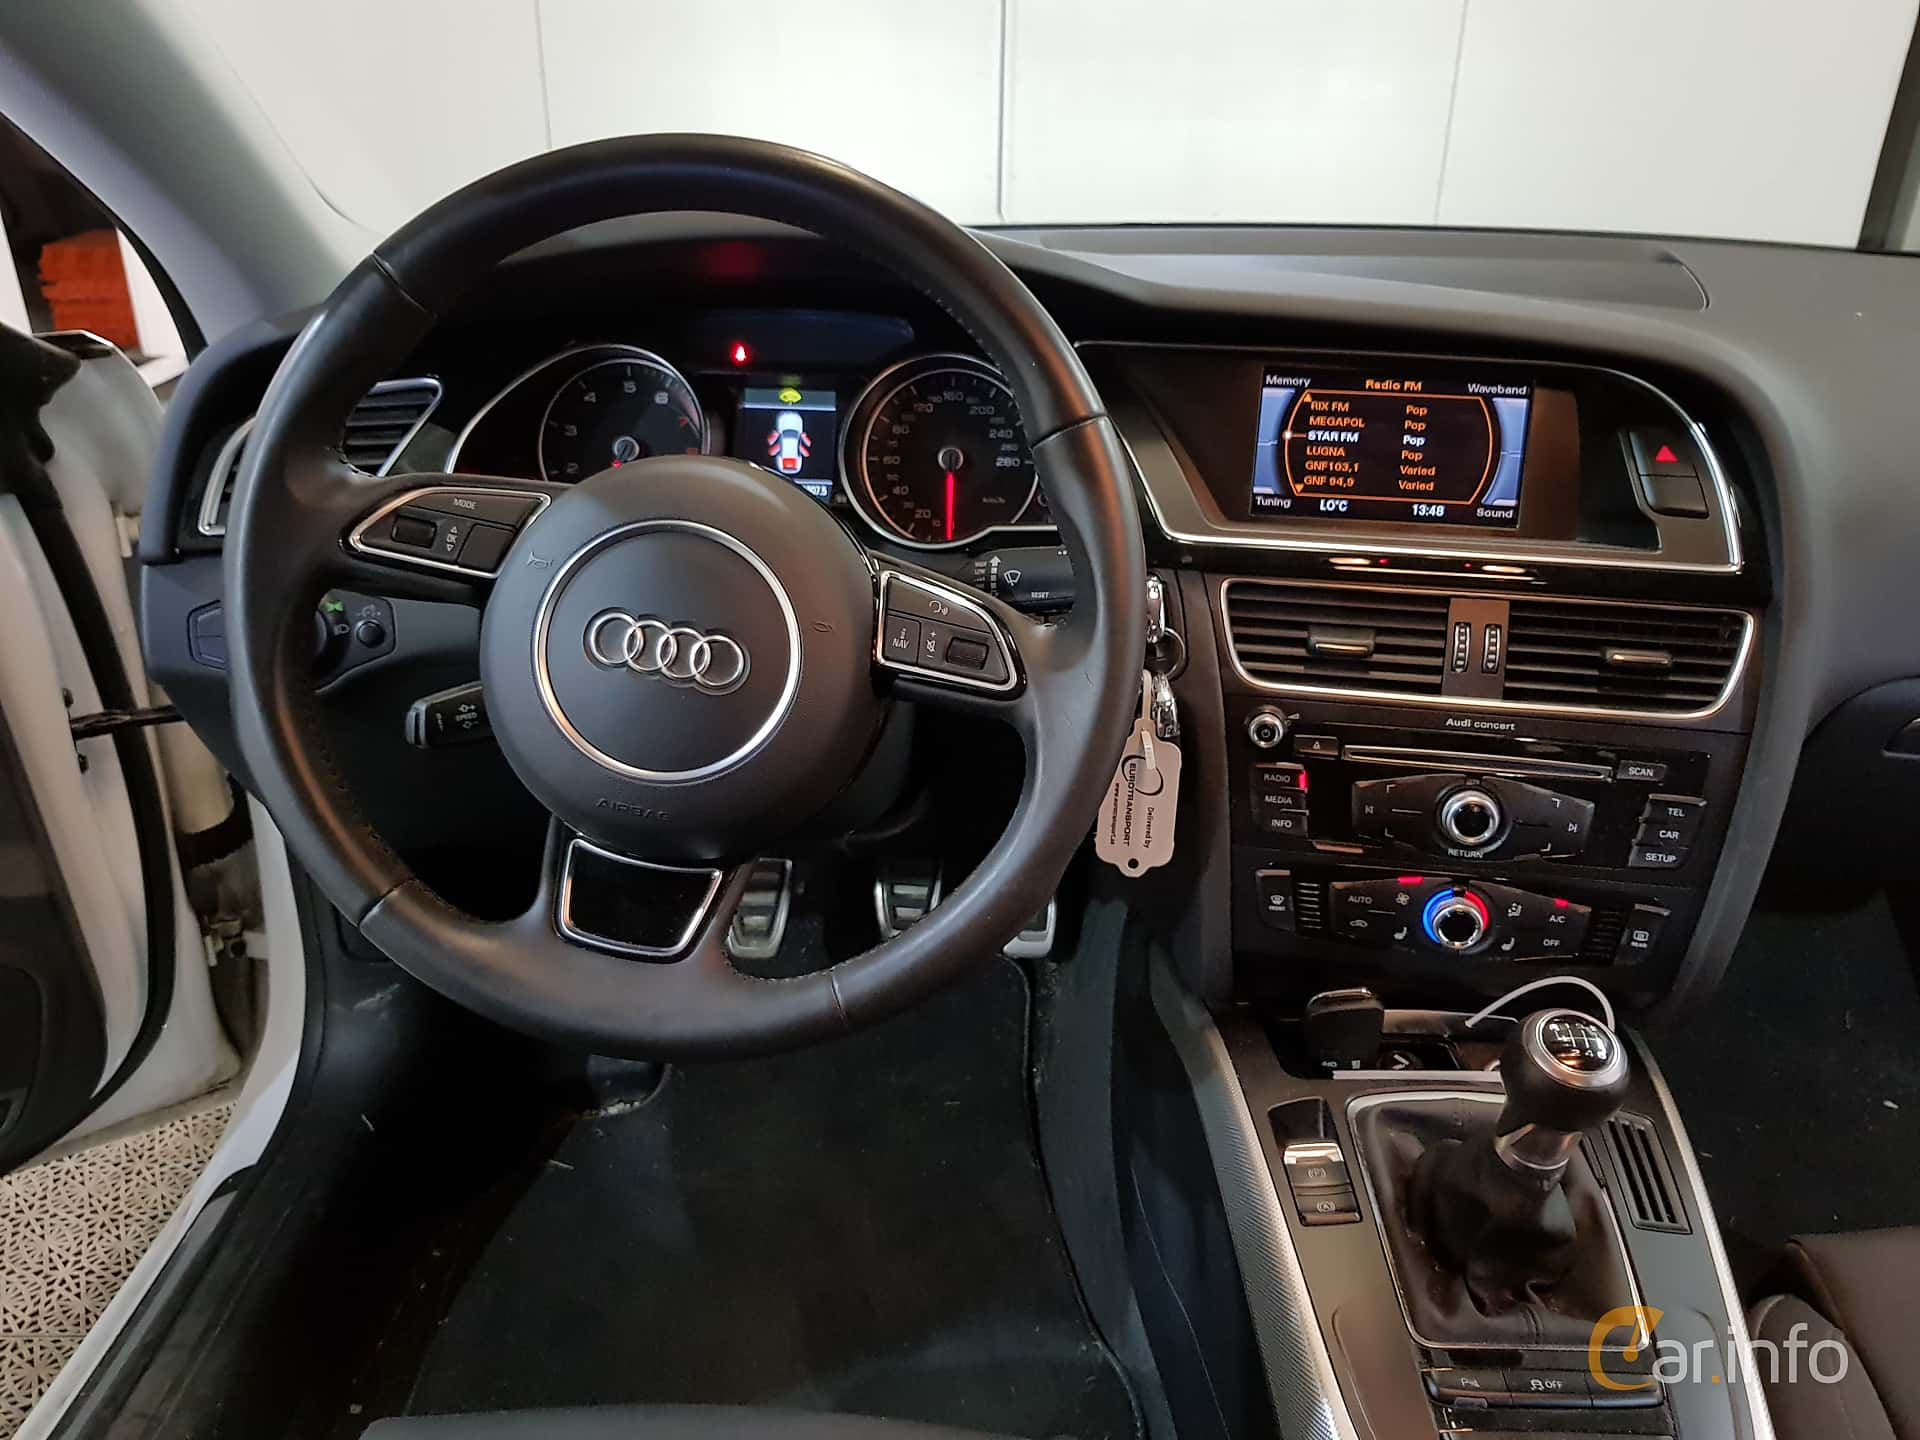 Audi A5 Sportback 1.8 TFSI Manual, 144hp, 2016